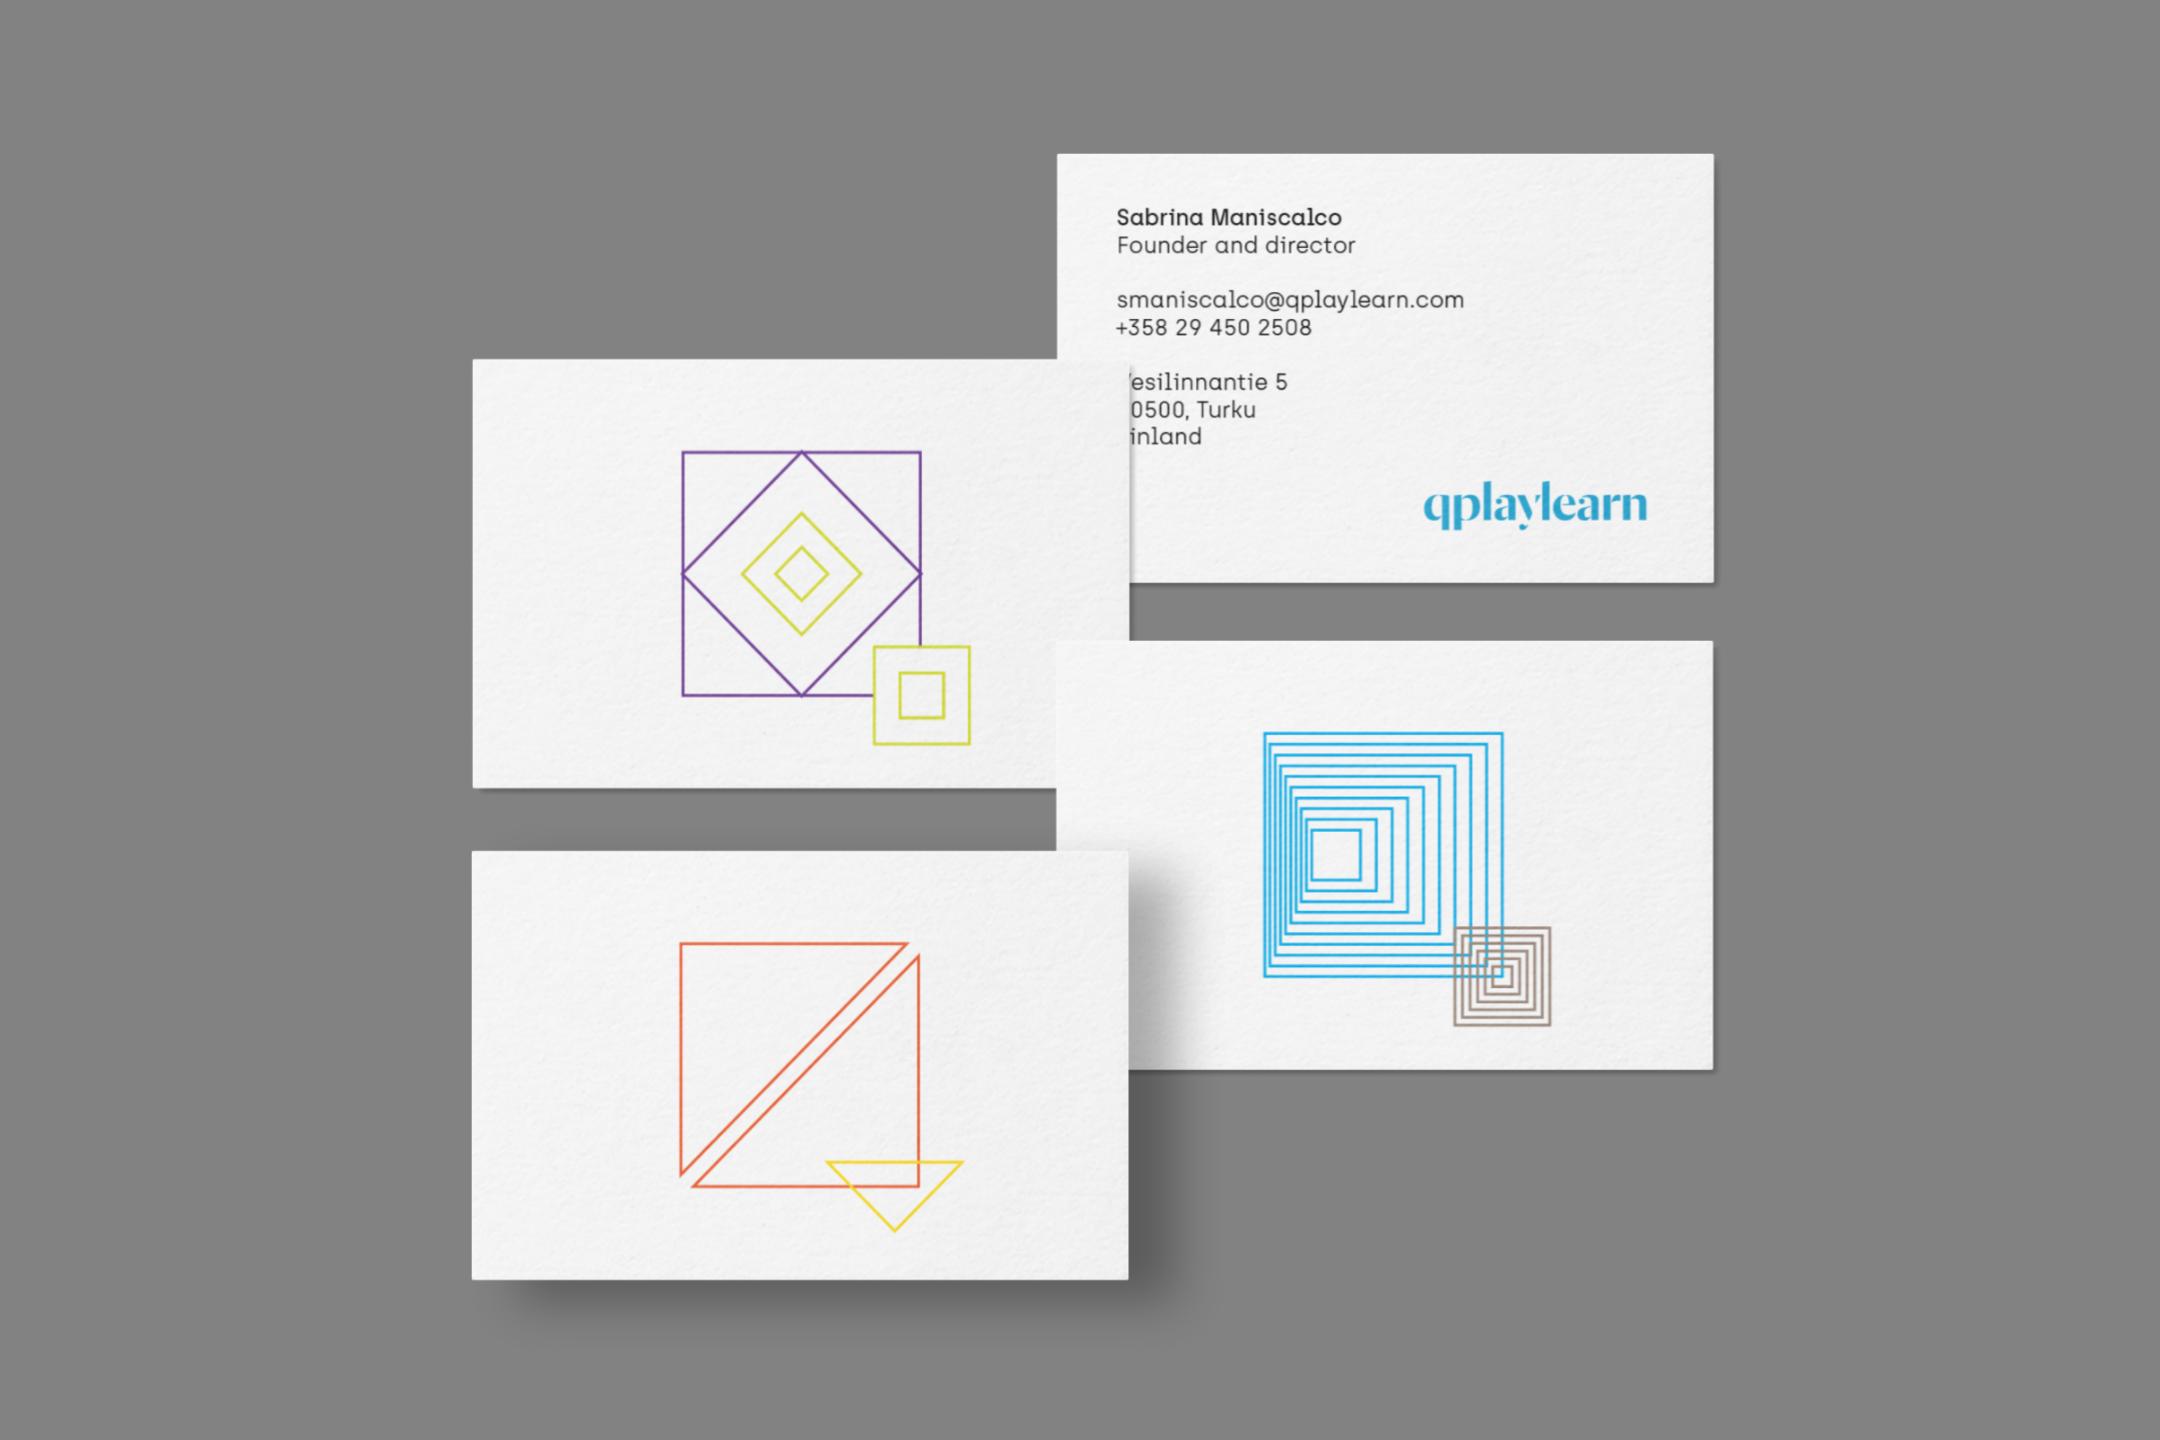 Qplaylearn-business-card-design-2